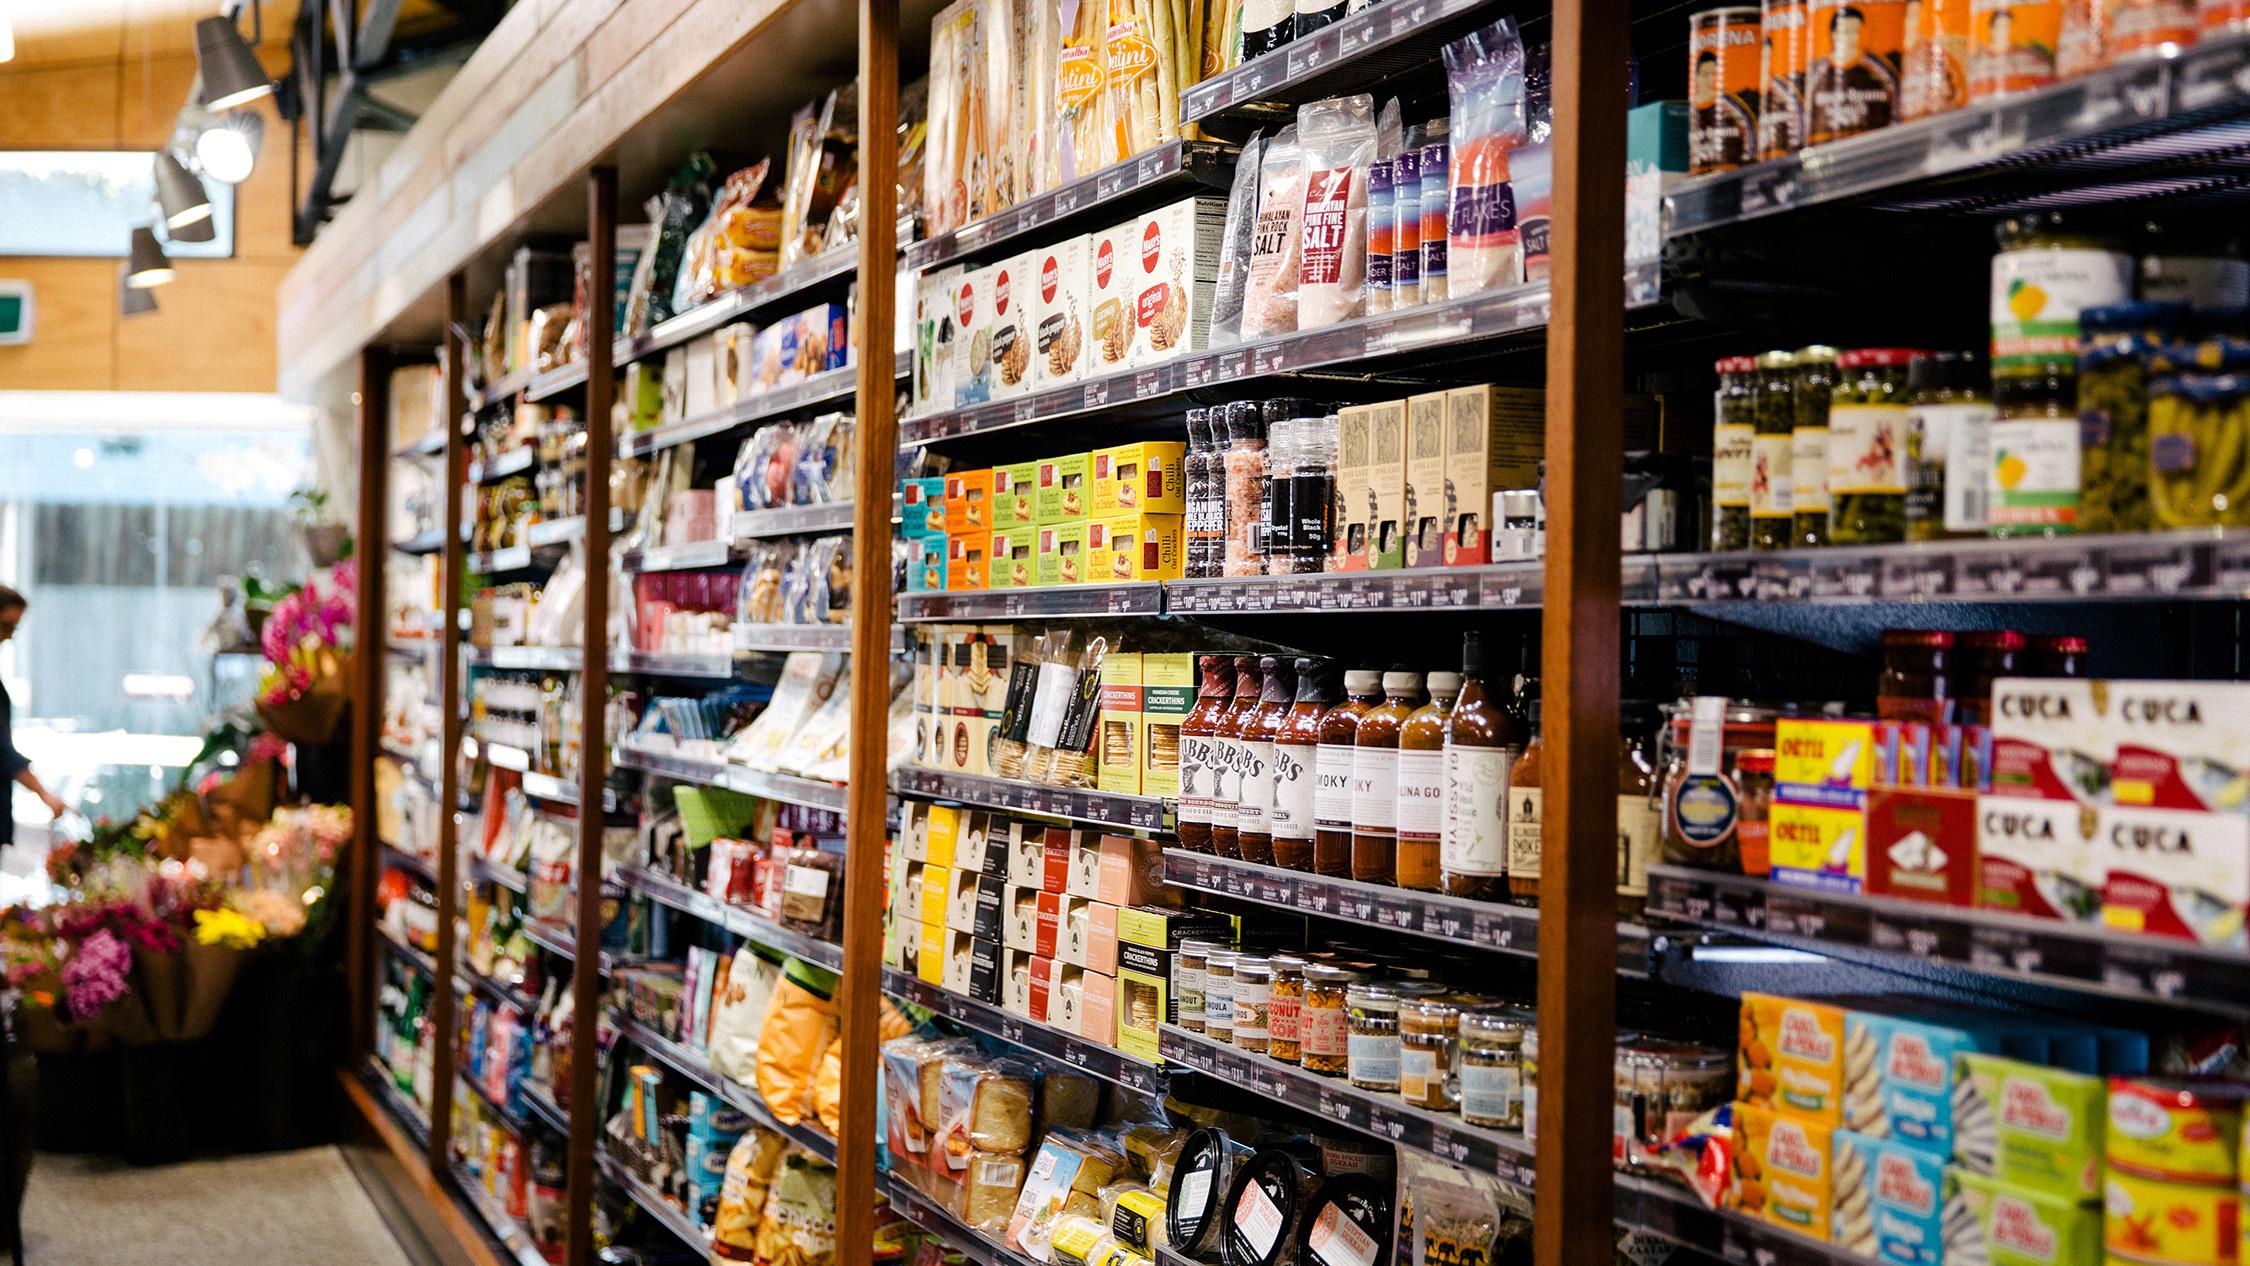 Shopping shelves at Hawthorne Garage